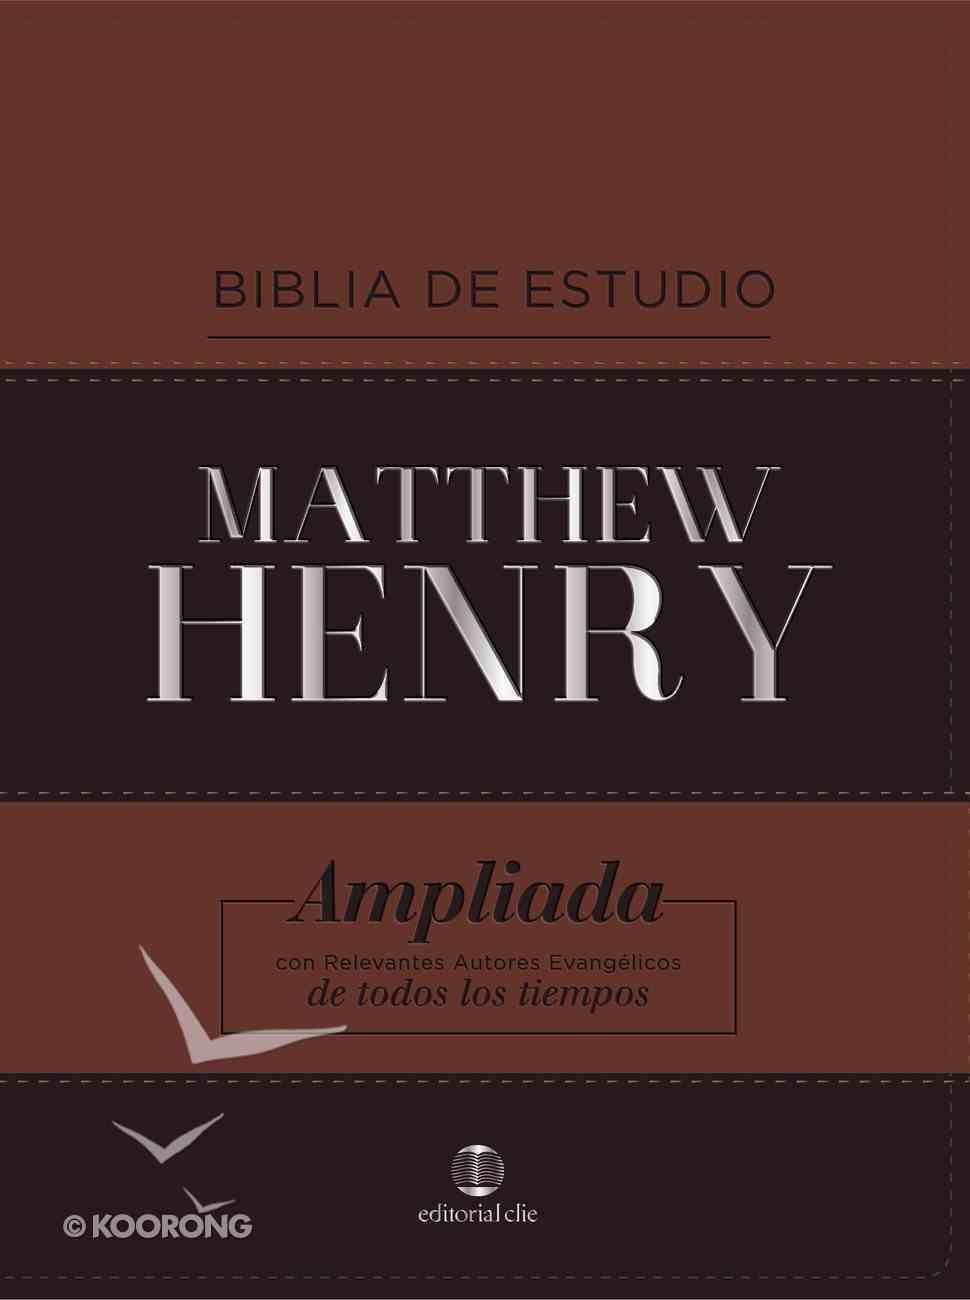 Rvr Biblia De Estudio Matthew Henry Clasica Con Indice Premium Imitation Leather